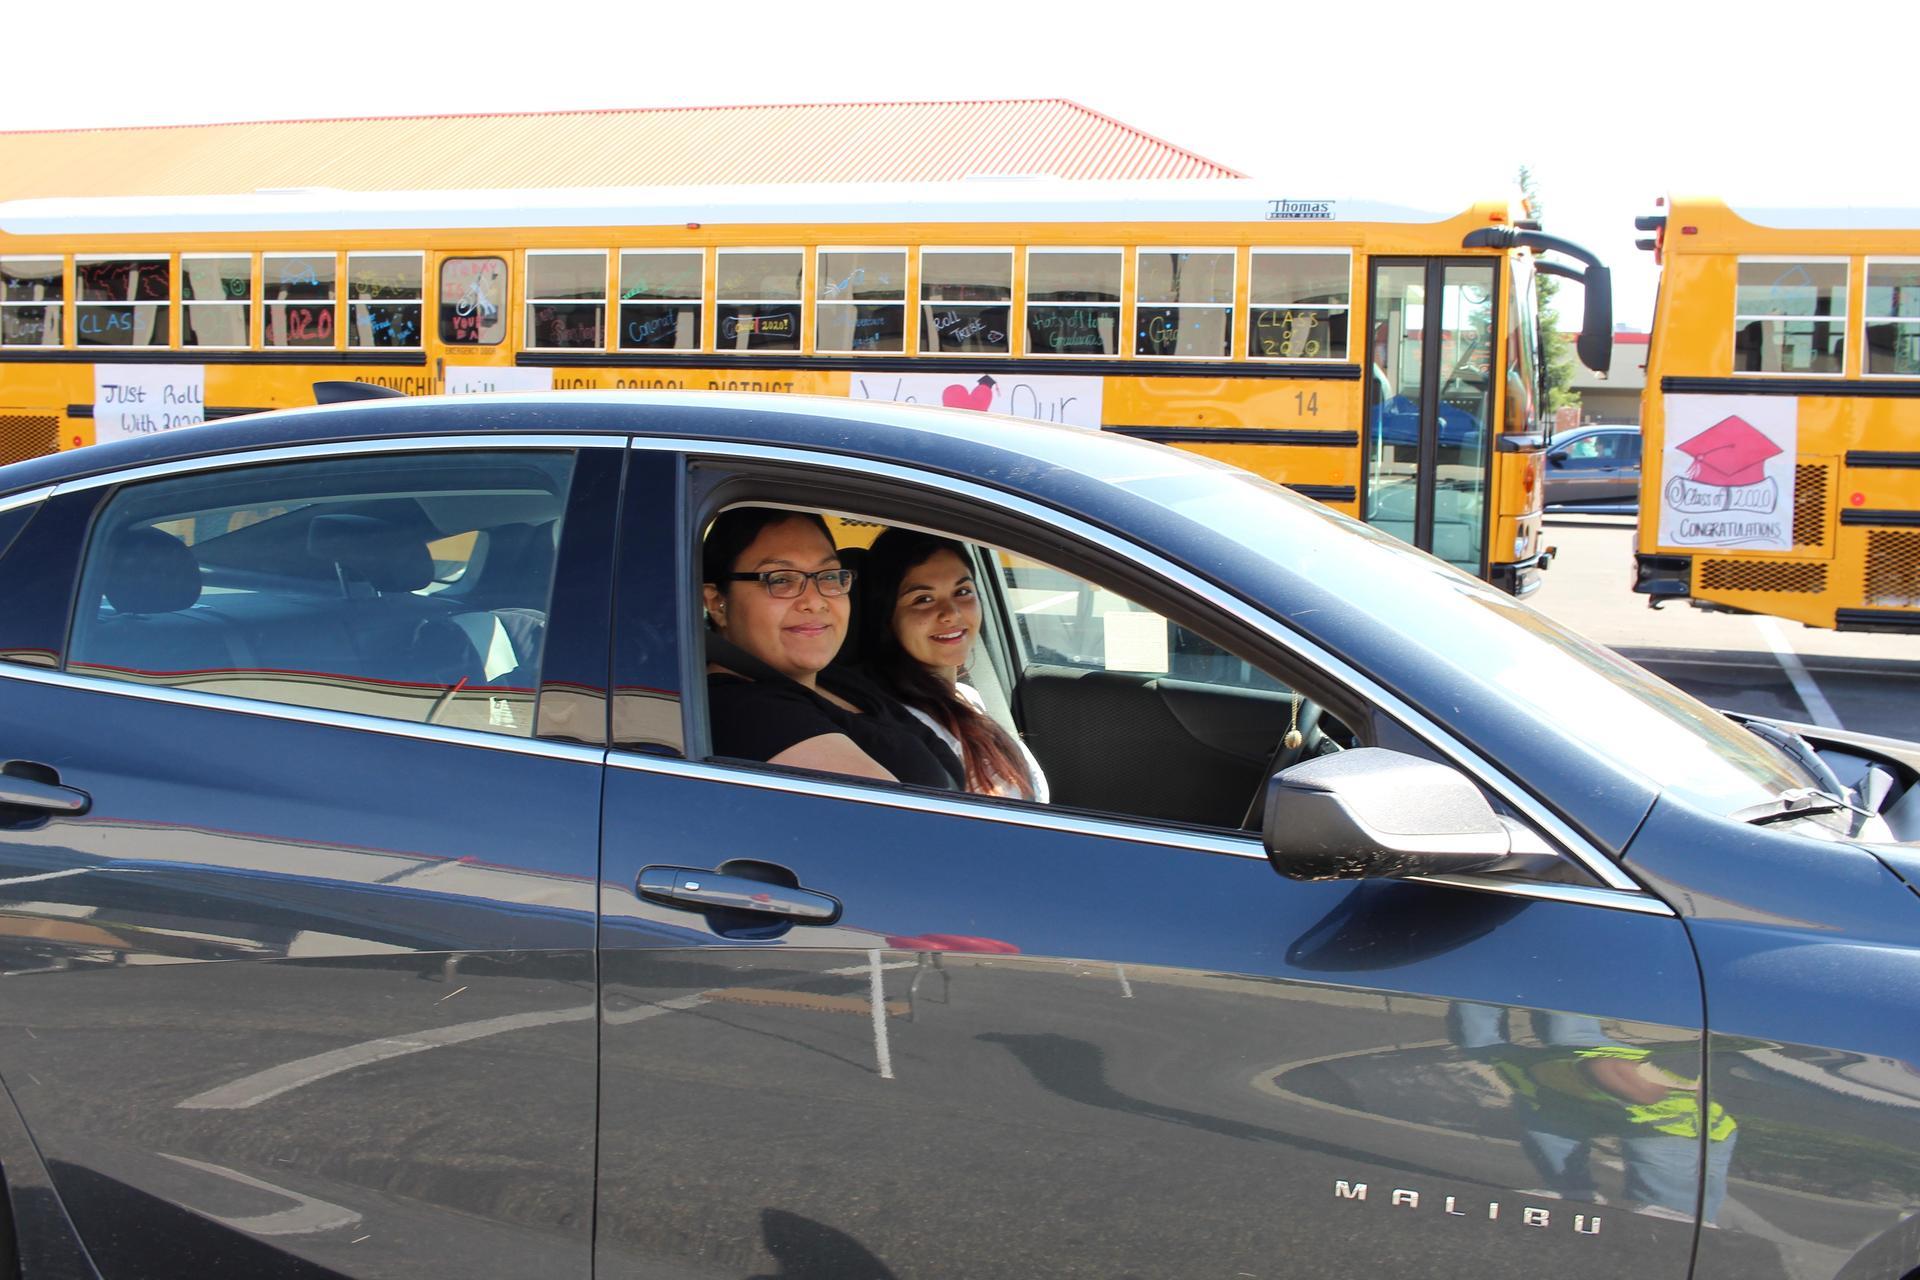 Fatima Benavides driving through